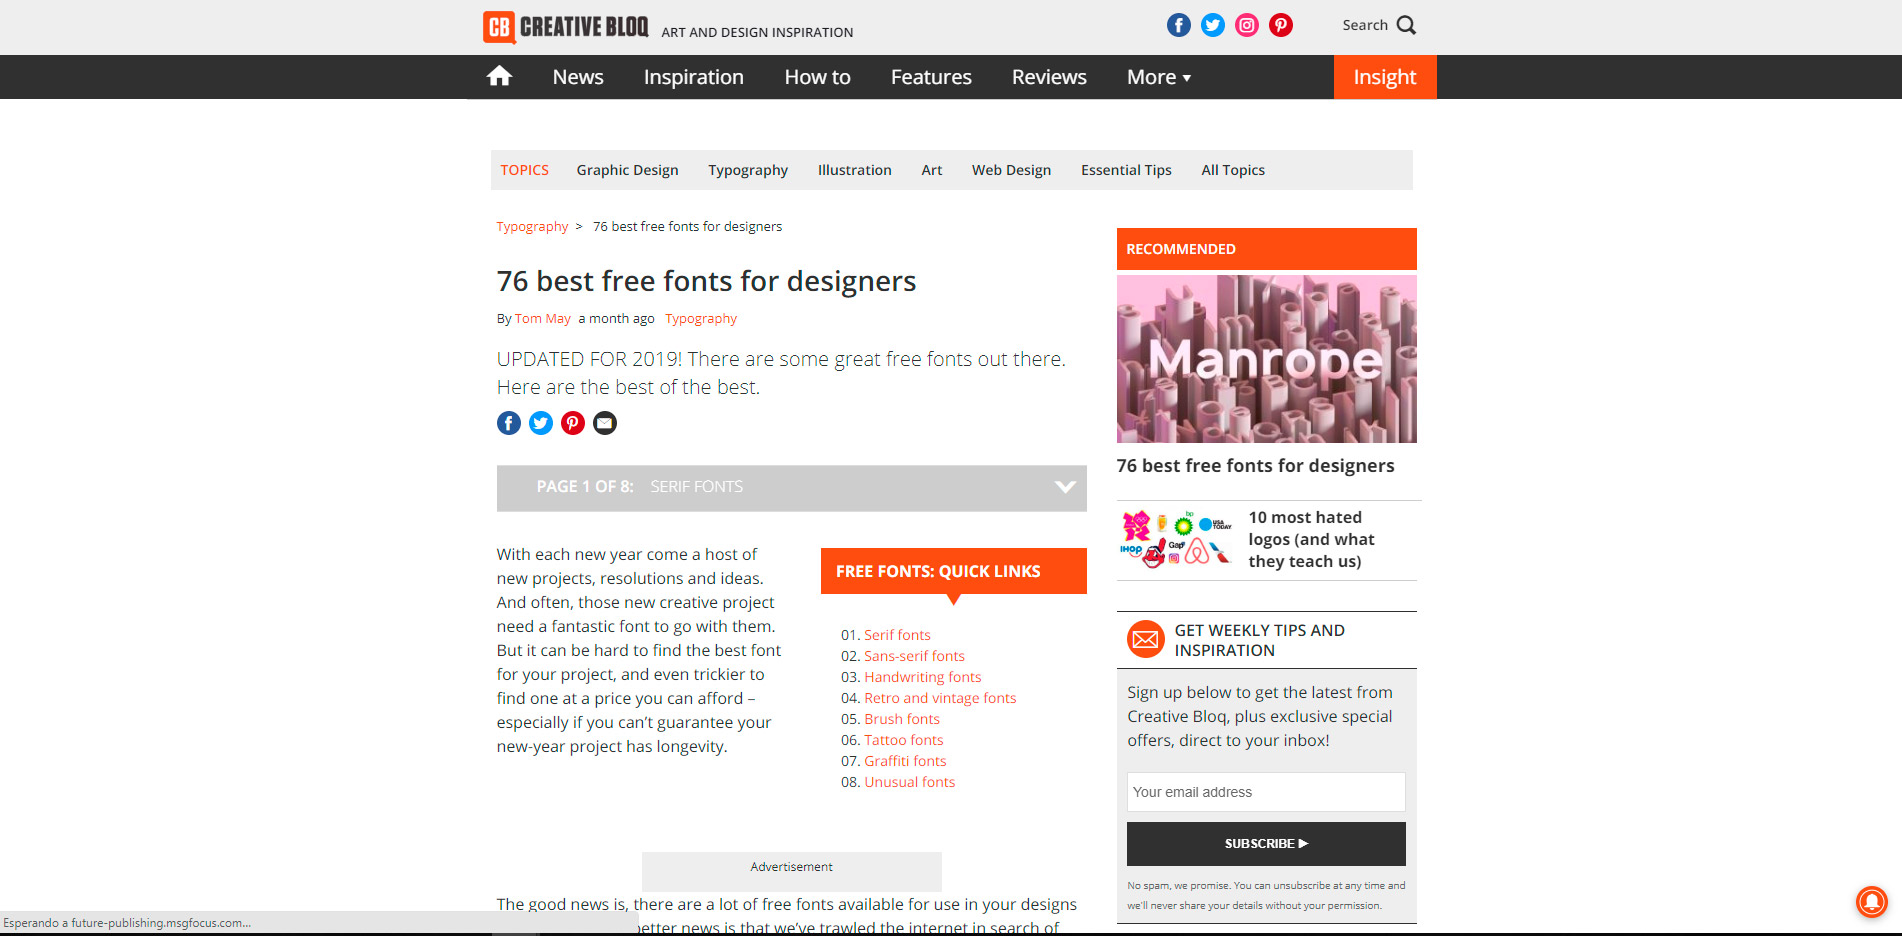 018_mejores_sitios_descarga_gratis_tipografia_fuentes_fonts__creativebloq